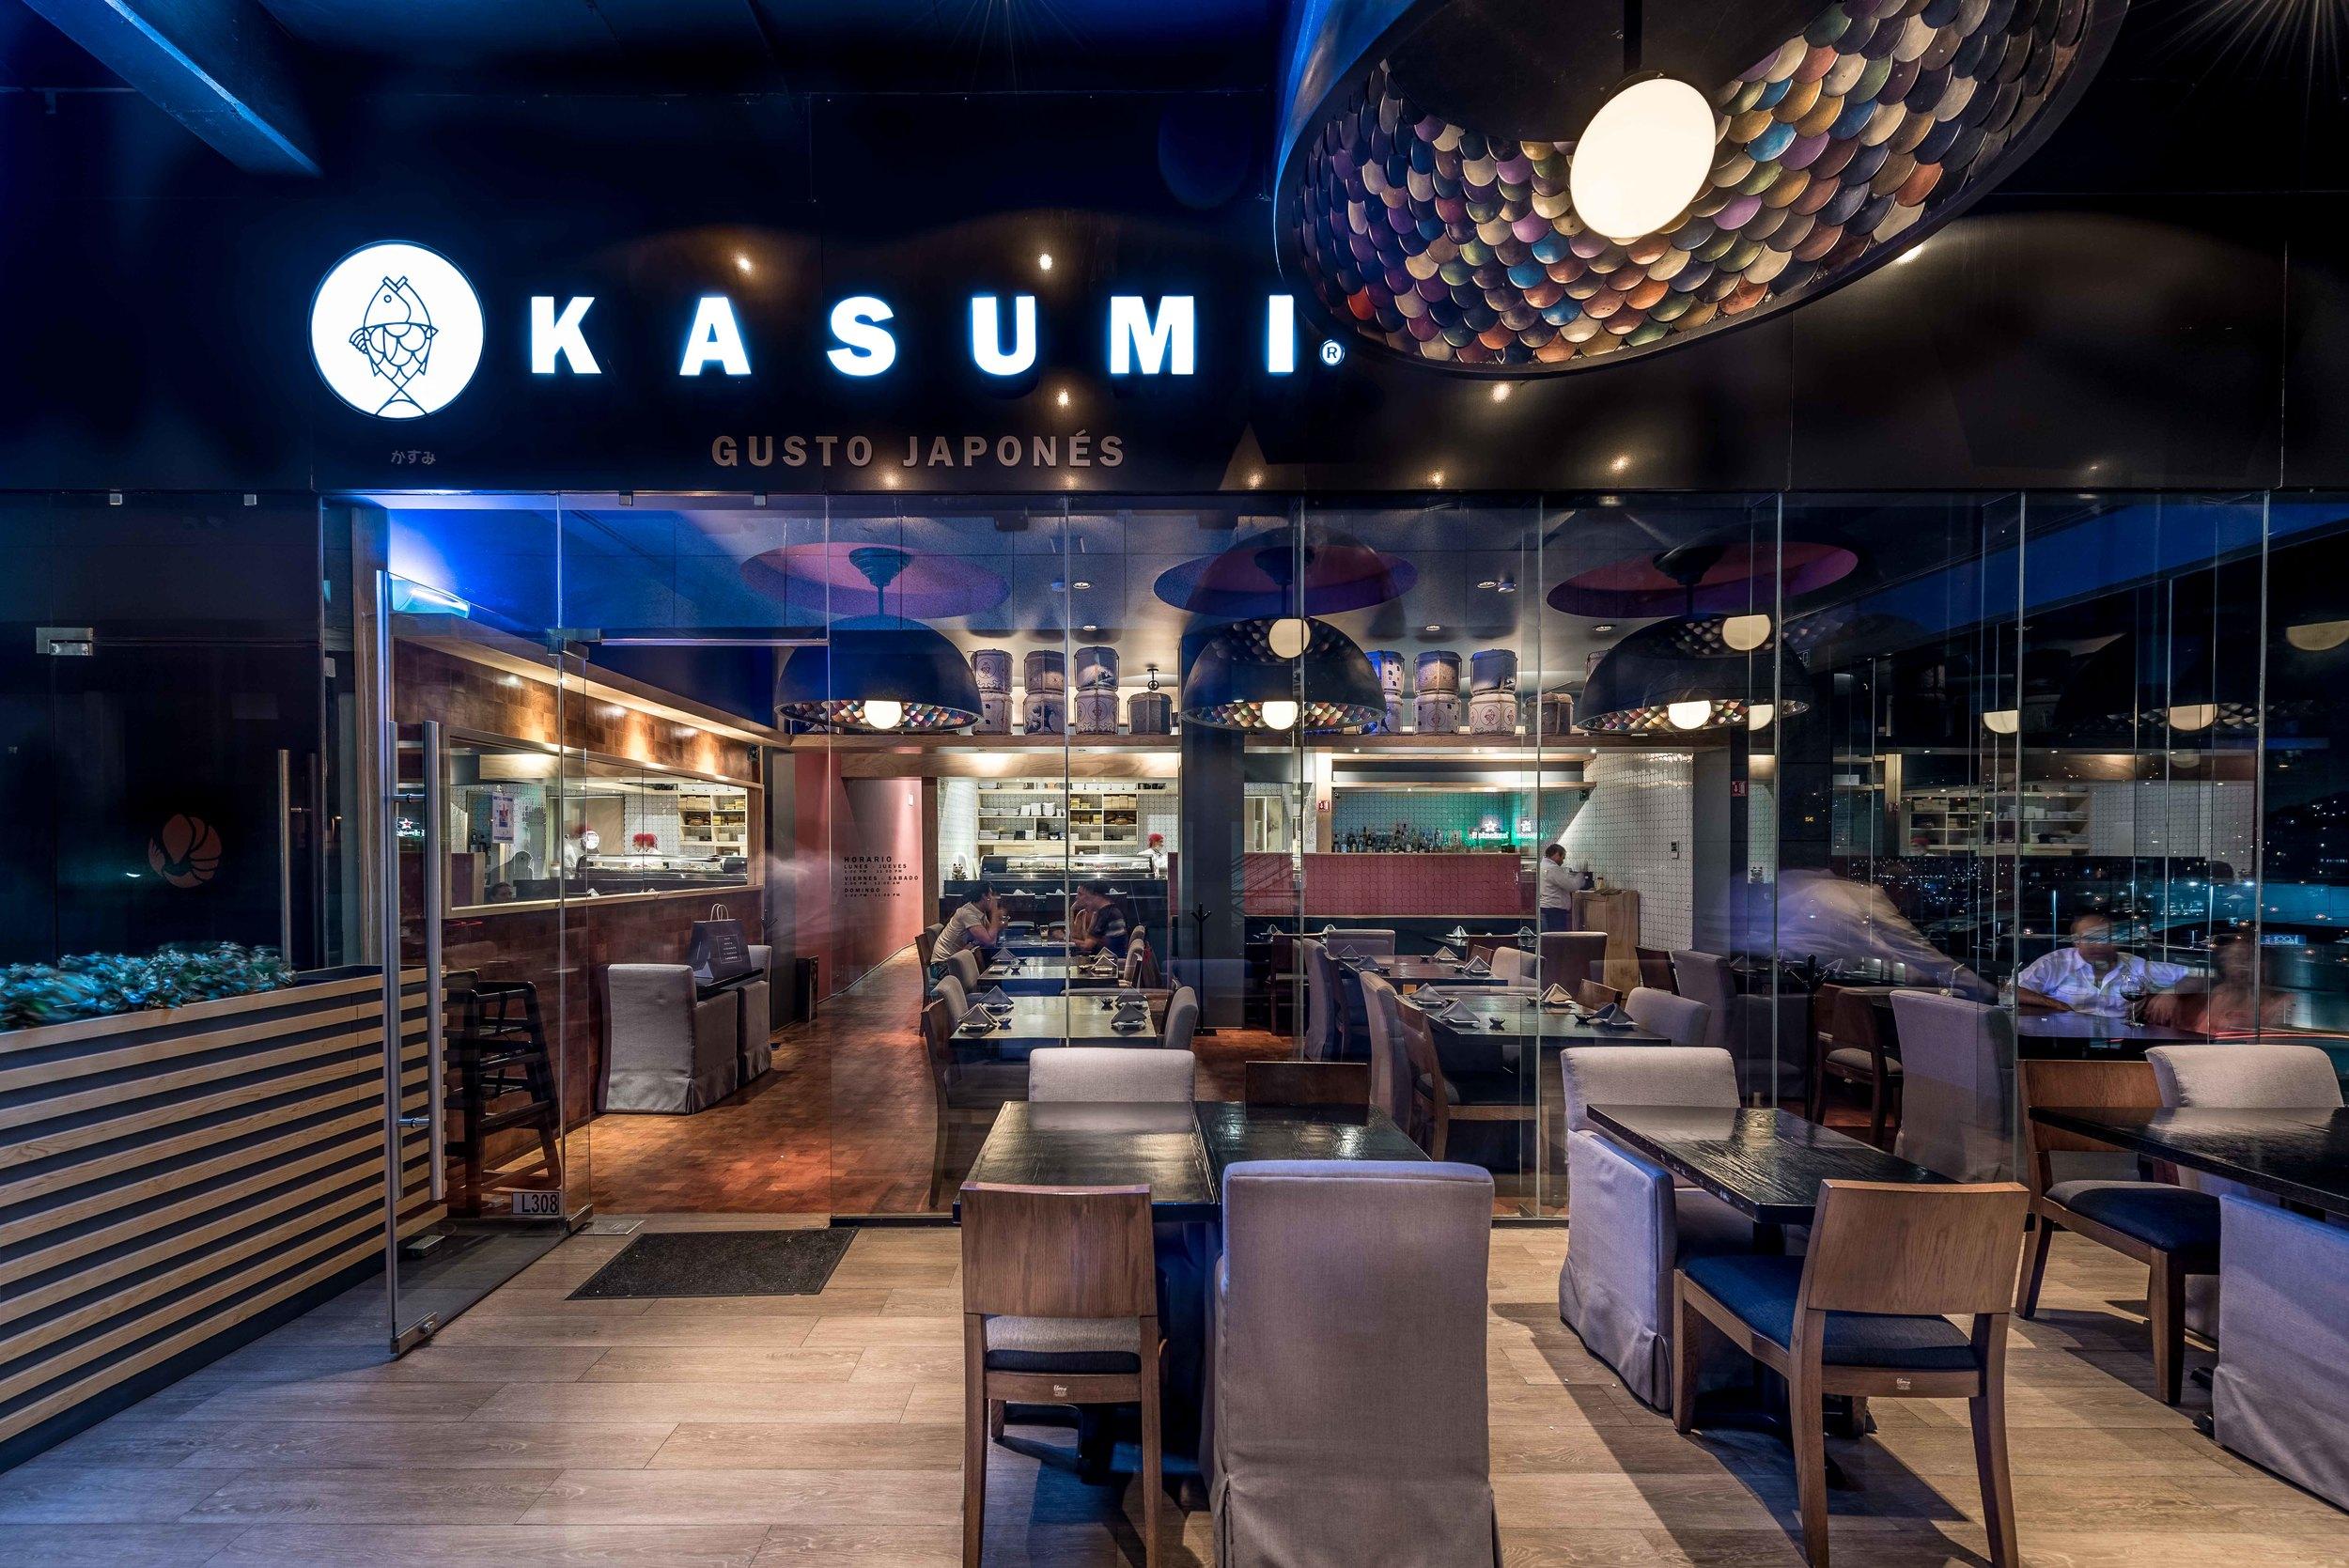 kasumi-1.jpg